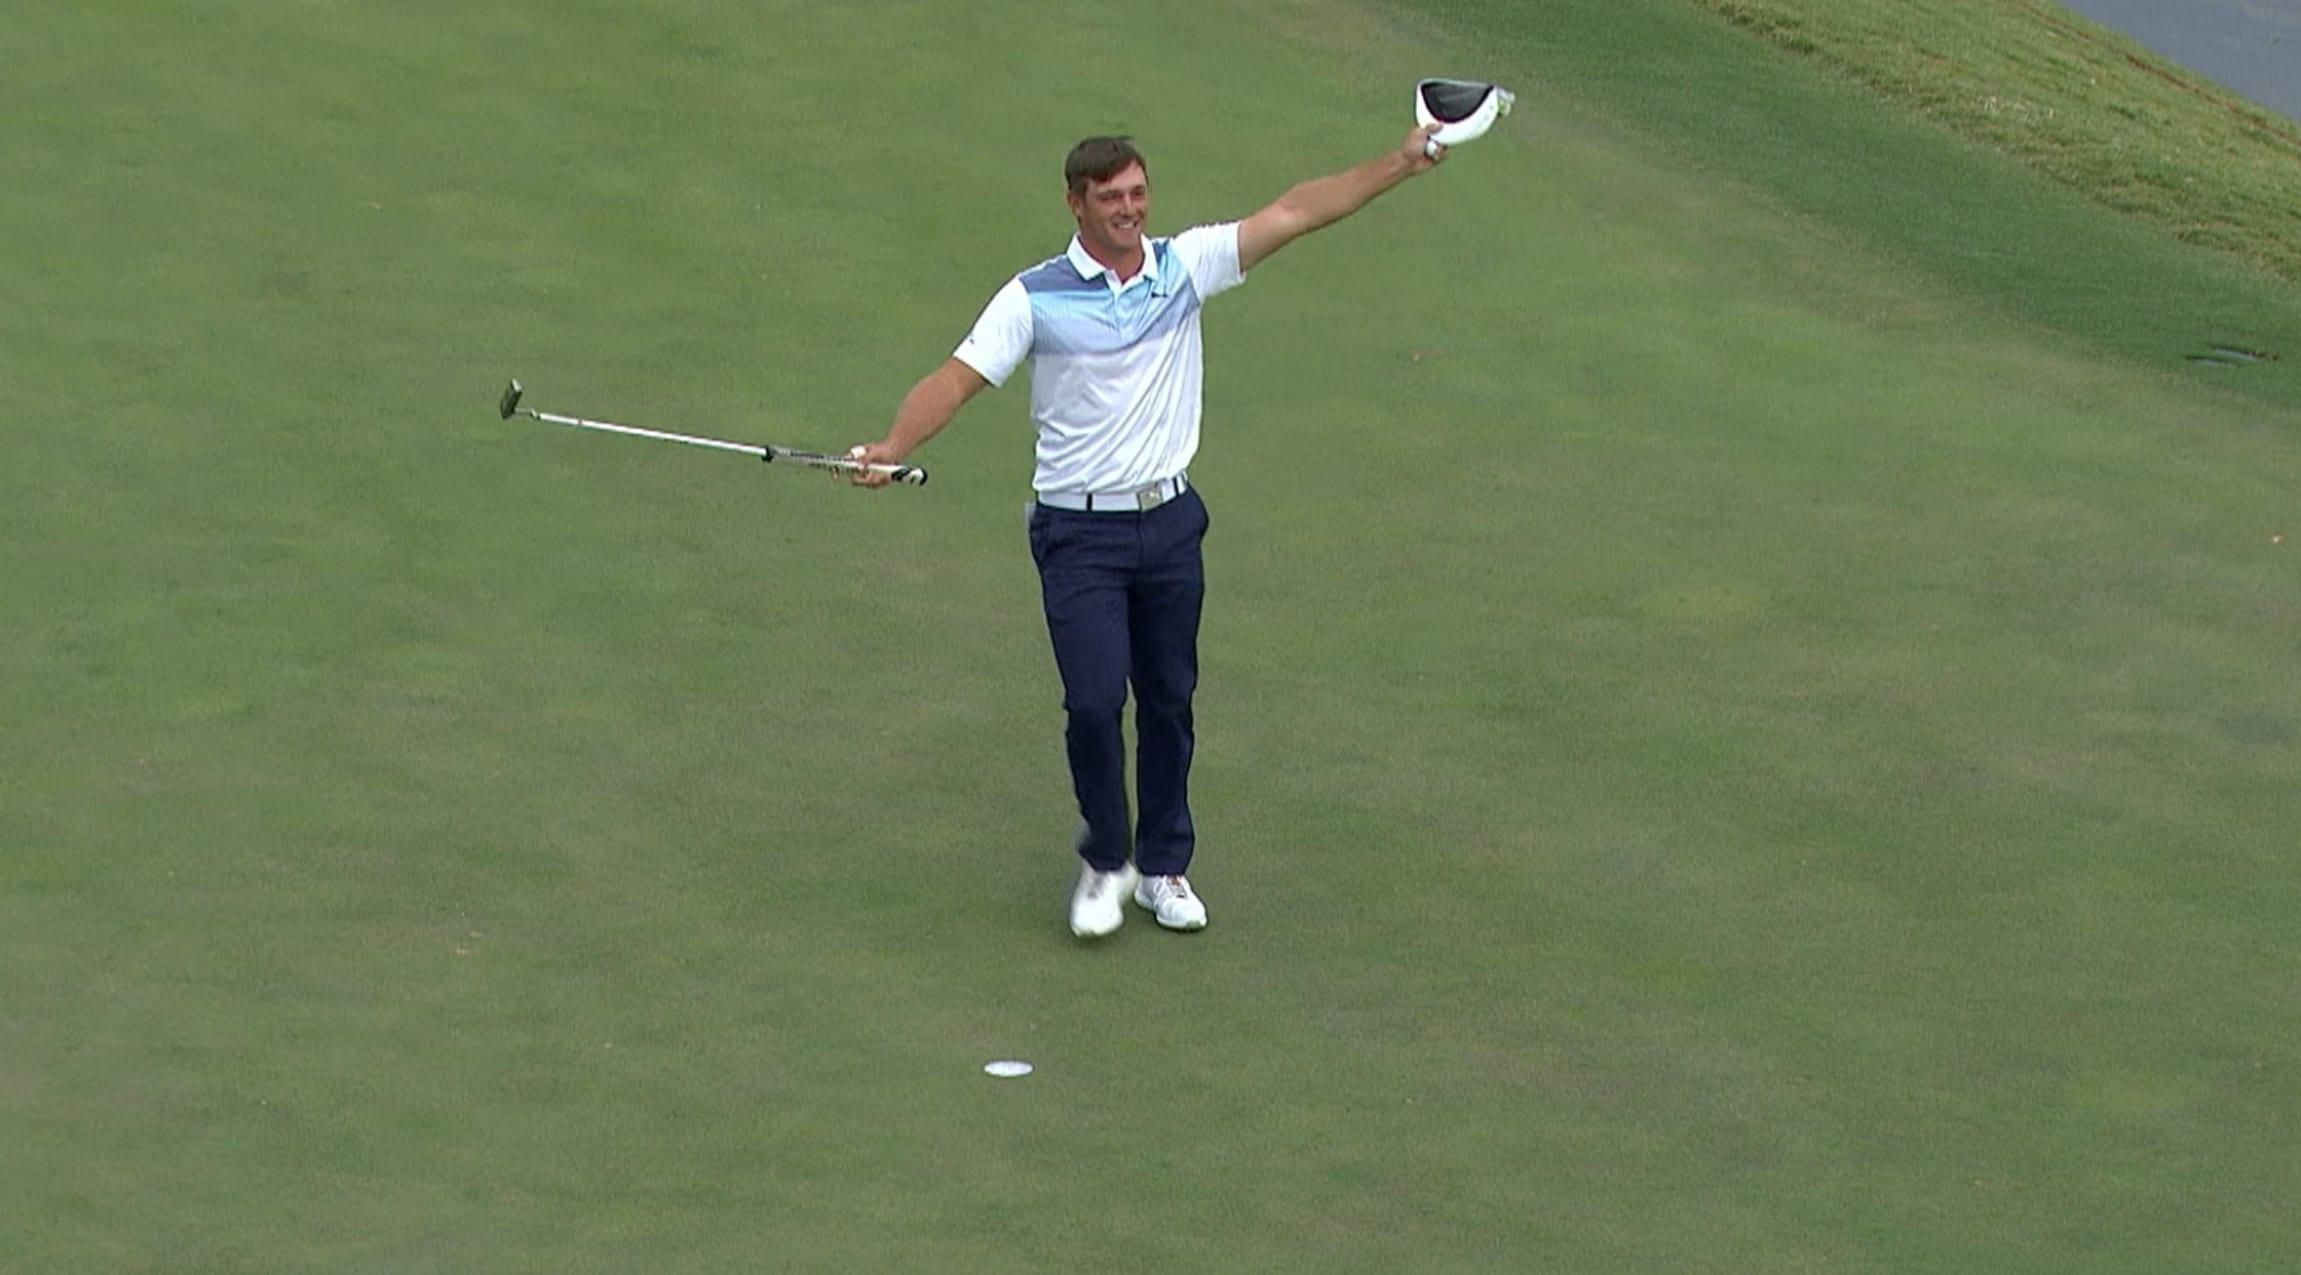 Bryson DeChambeau PGA TOUR Profile - News, Stats, and Videos